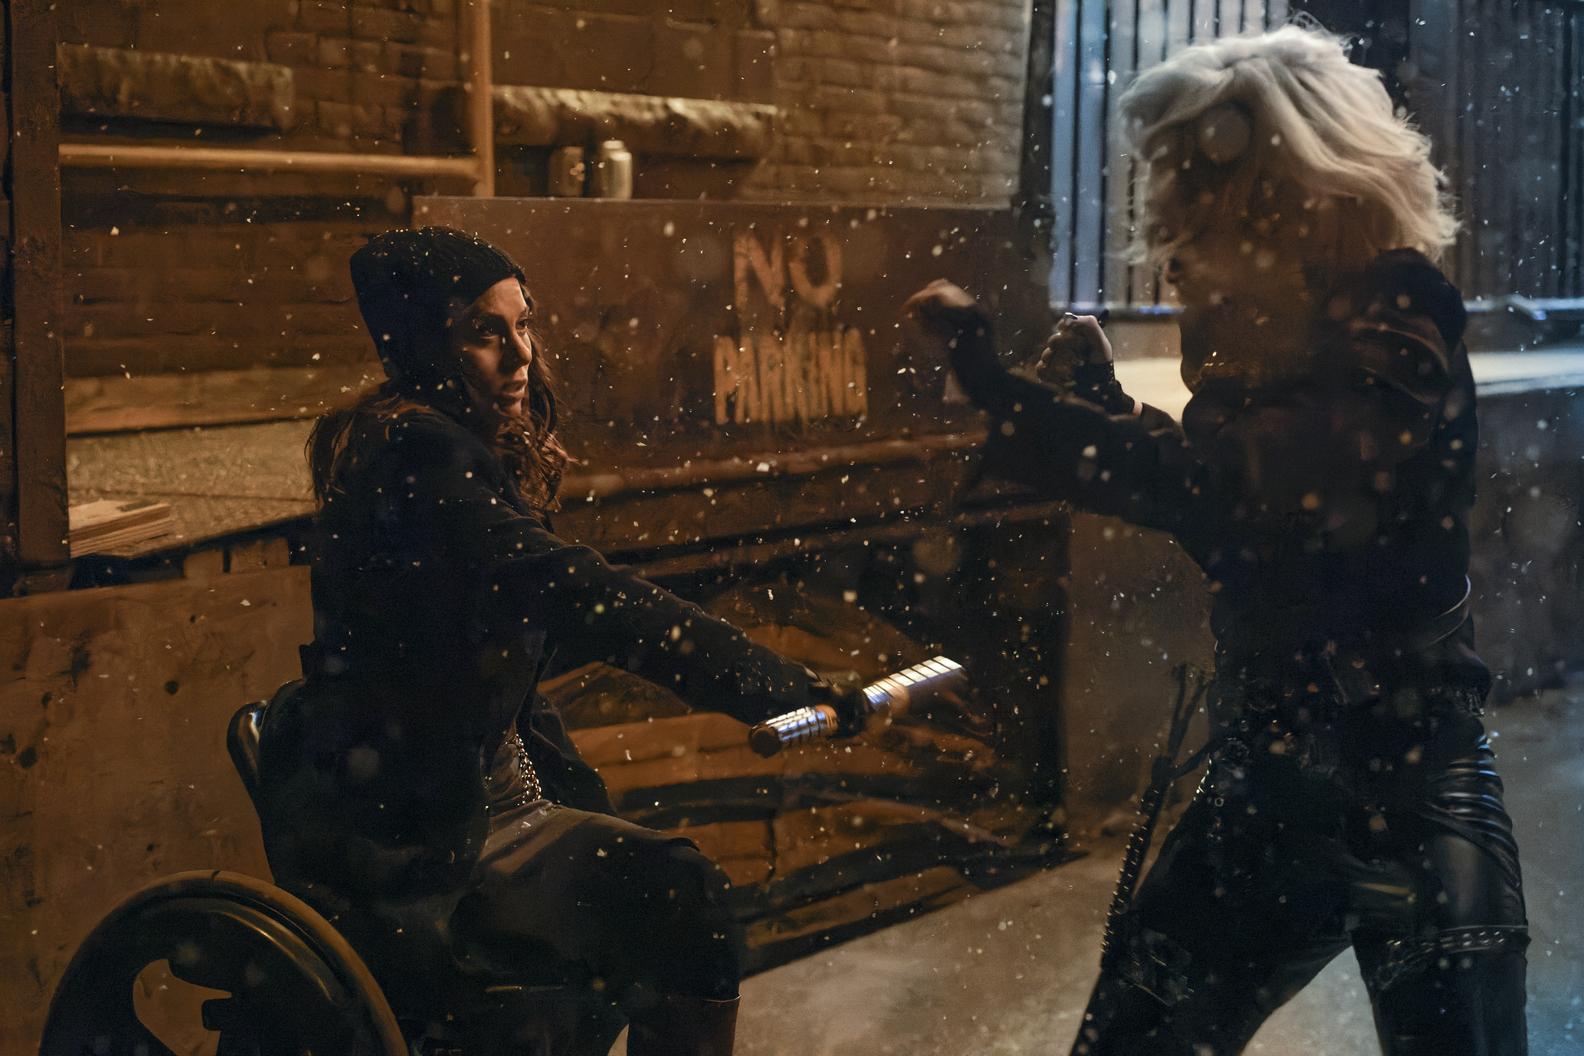 Savanna Wech and Kimbery Sue Murray in Titans Season 3 Episode 6